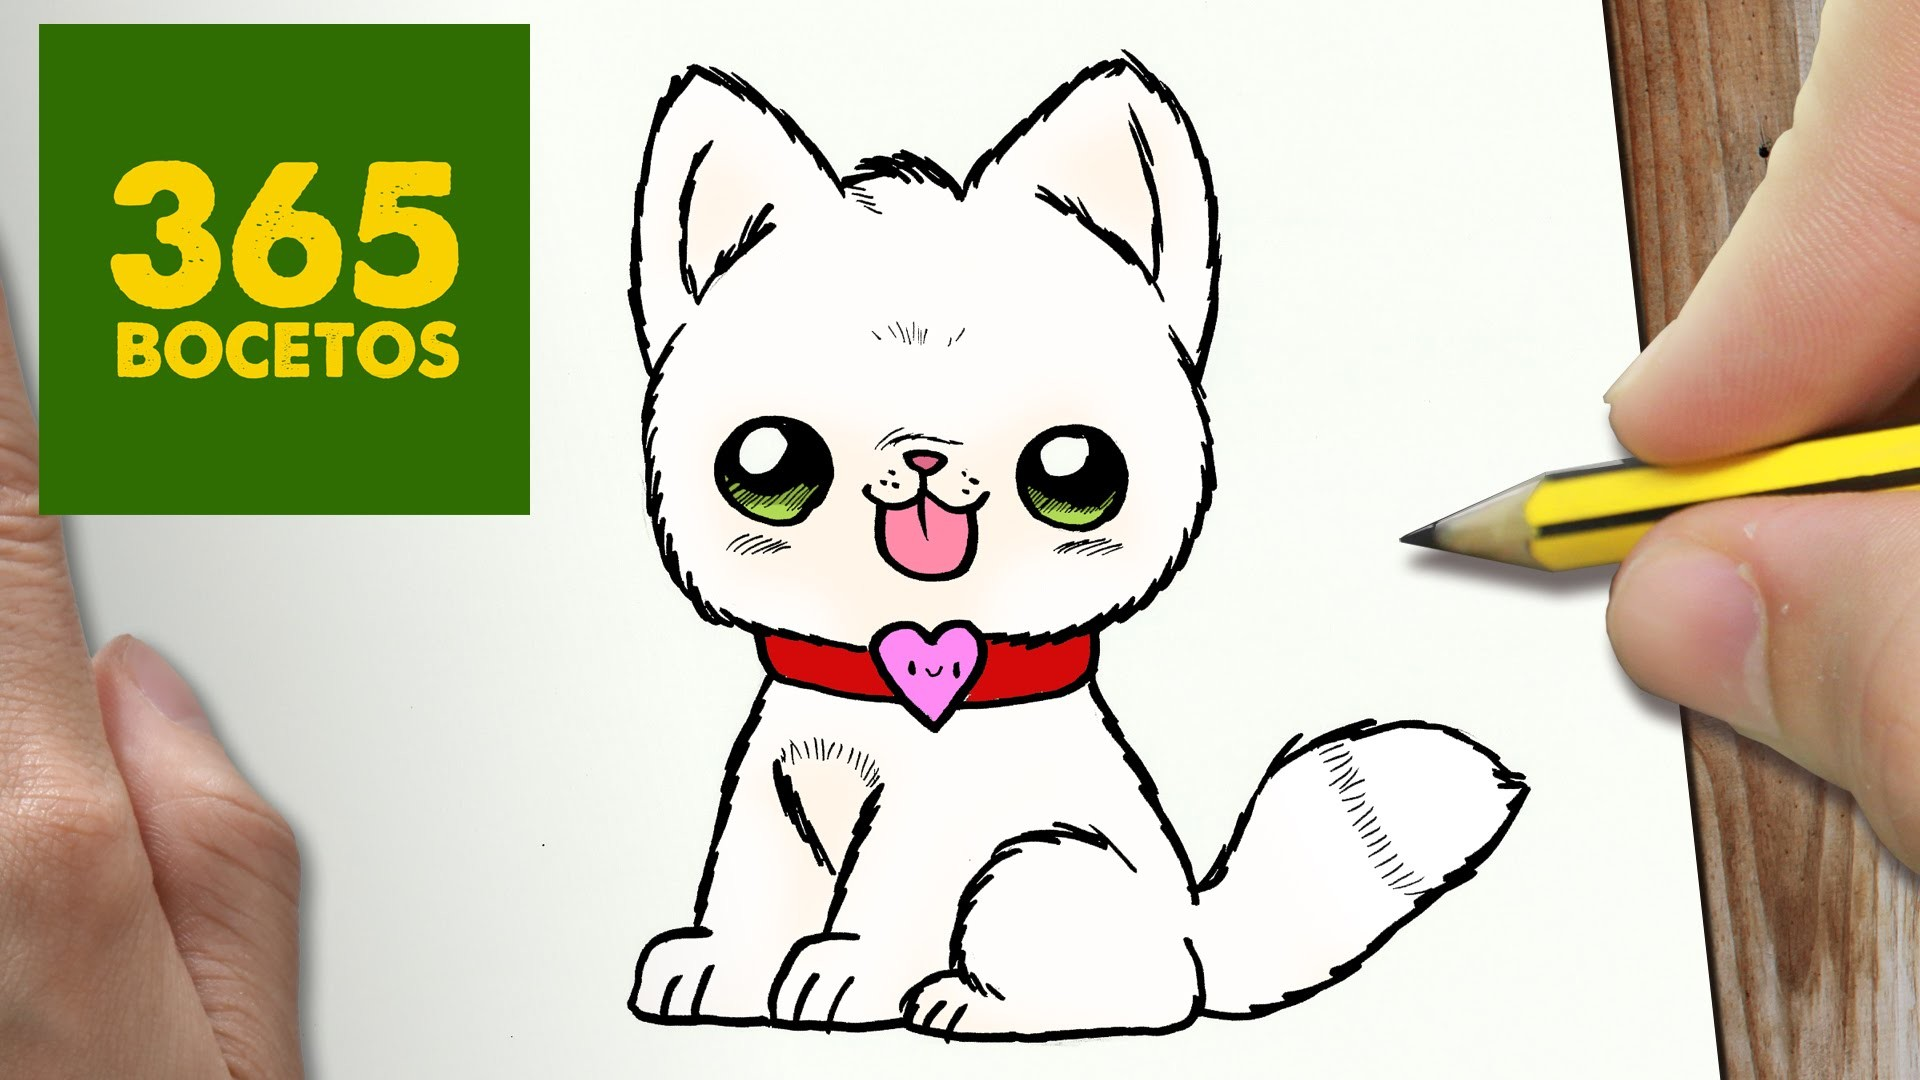 Como Dibujar Perro Kawaii Paso A Paso Dibujos Kawaii Faciles How